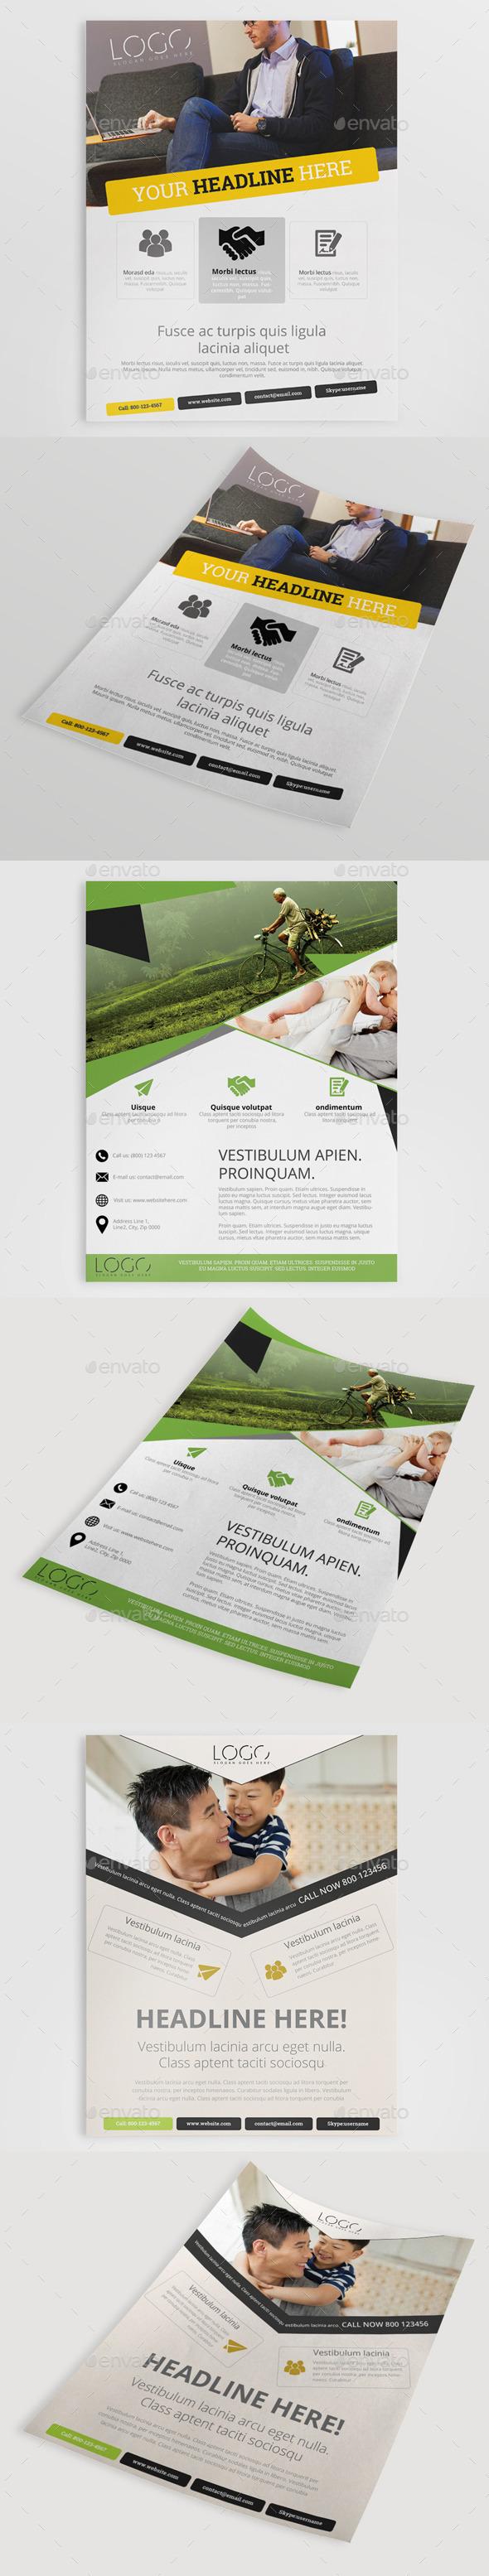 GraphicRiver 3in1 Corporate Flyer Bundle 10376925